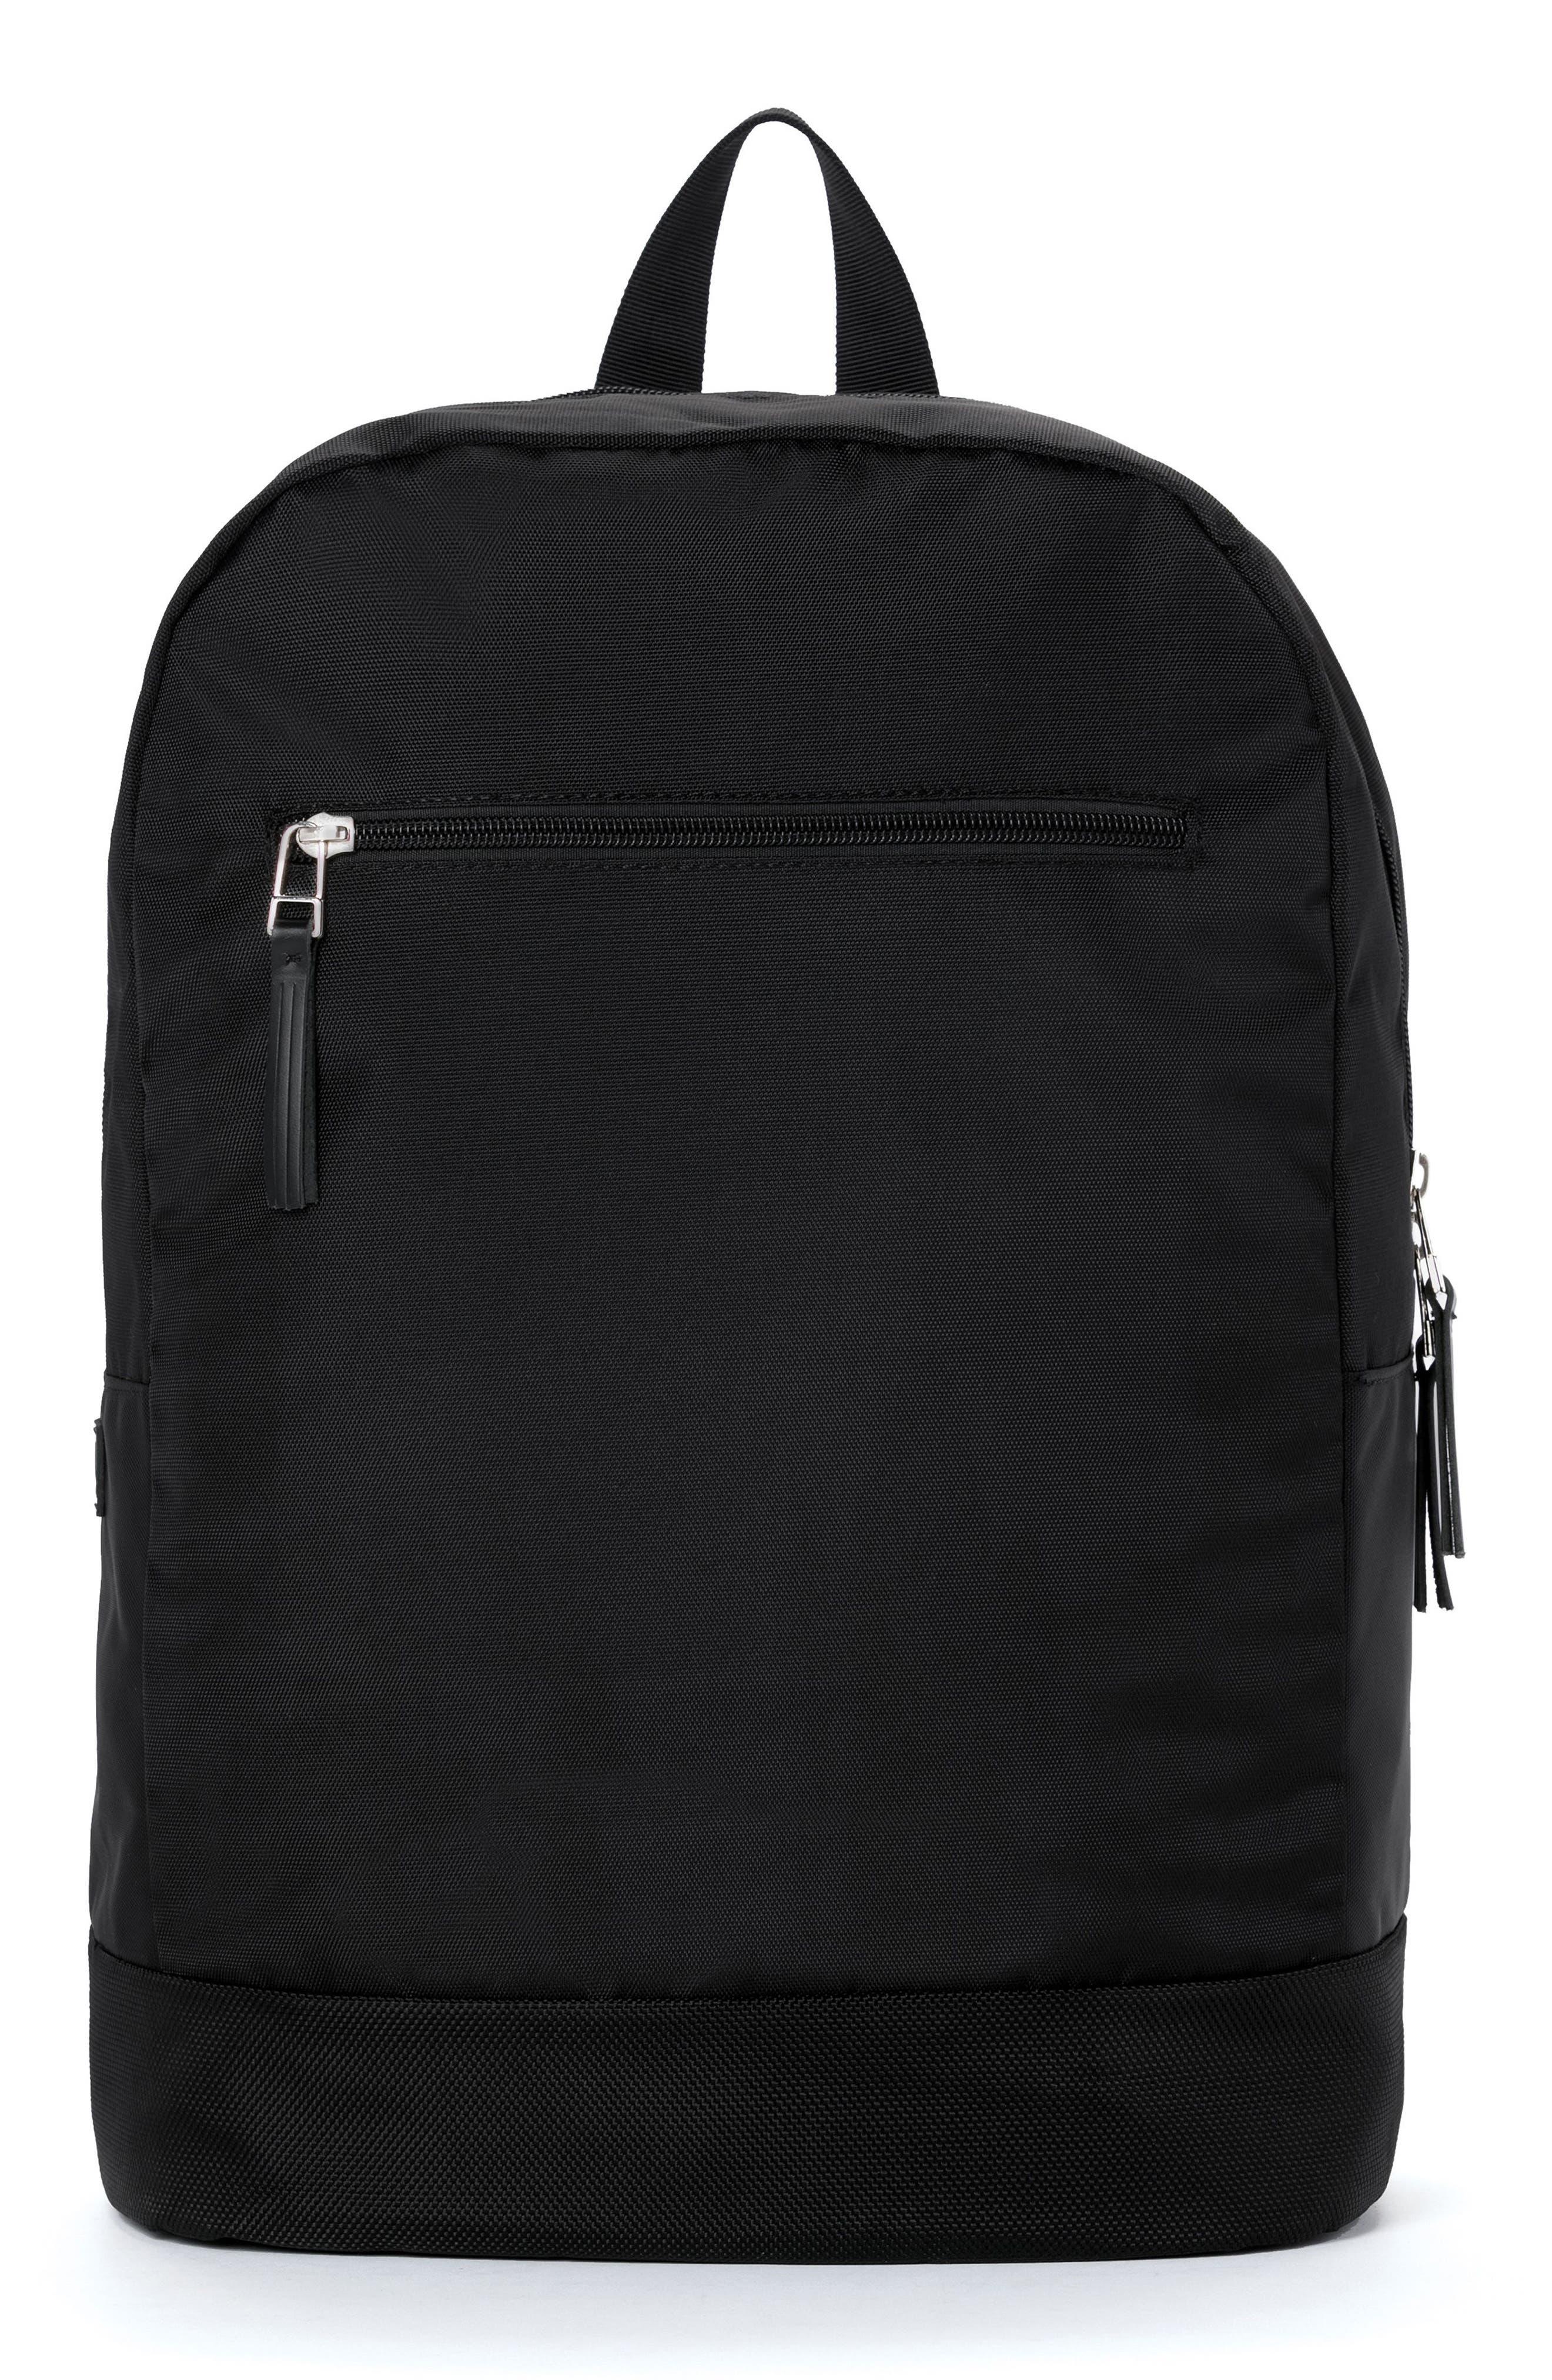 Tomcat Backpack,                         Main,                         color, Black